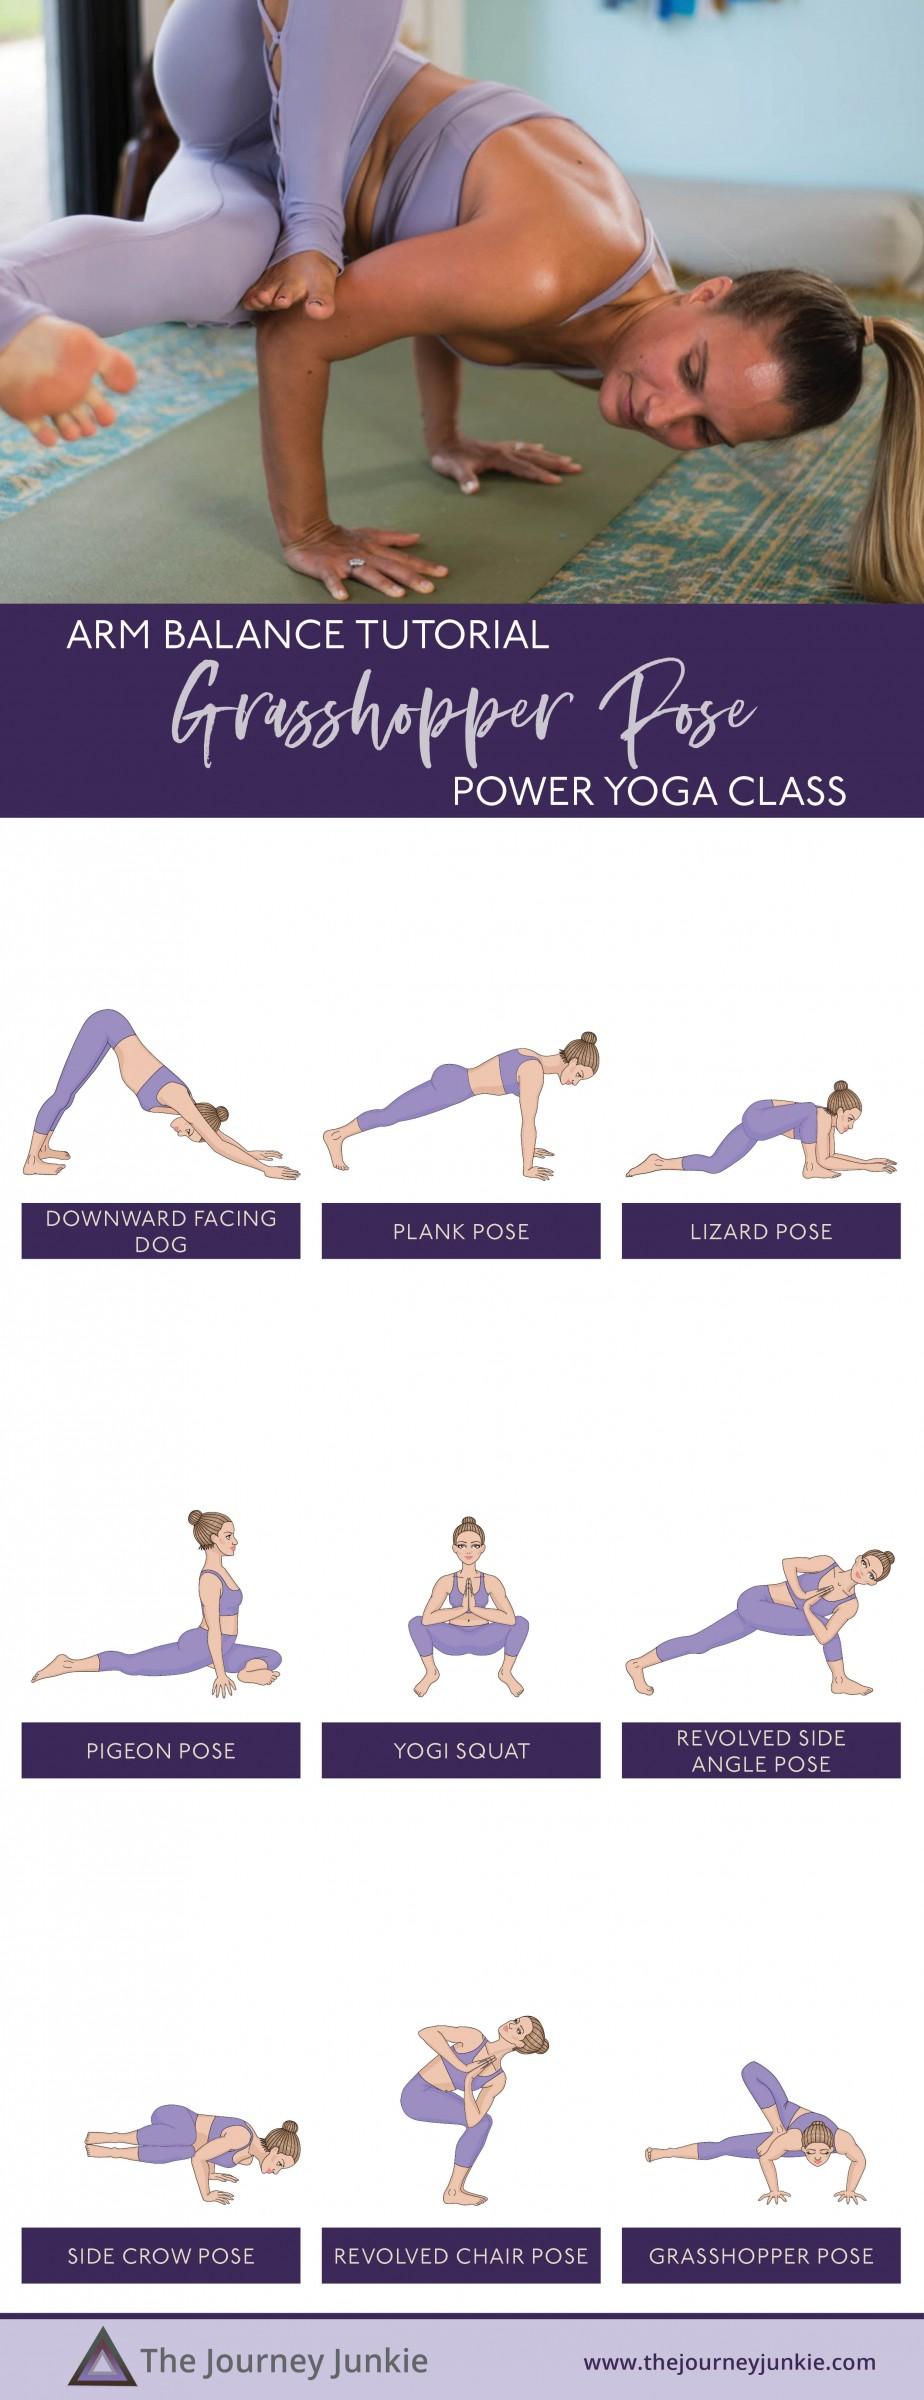 Grasshopper Yoga Pose Video: Twist + Hip Opener Flow | Arm ...